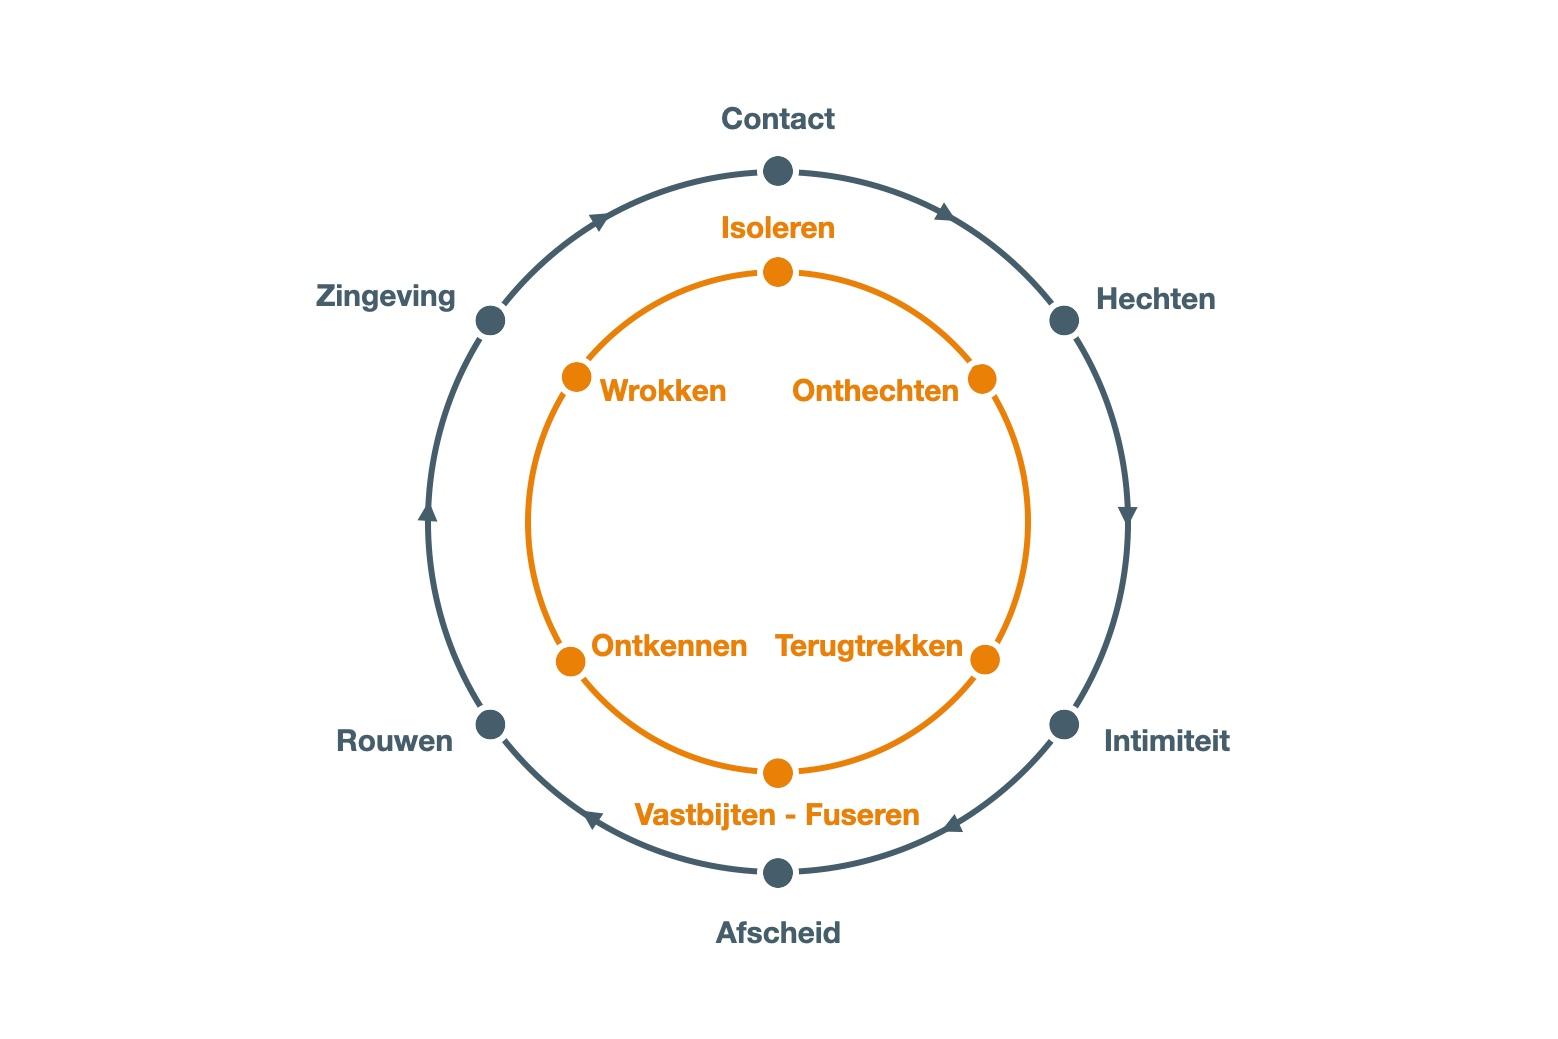 Contactcirkel - Transitiecirkel